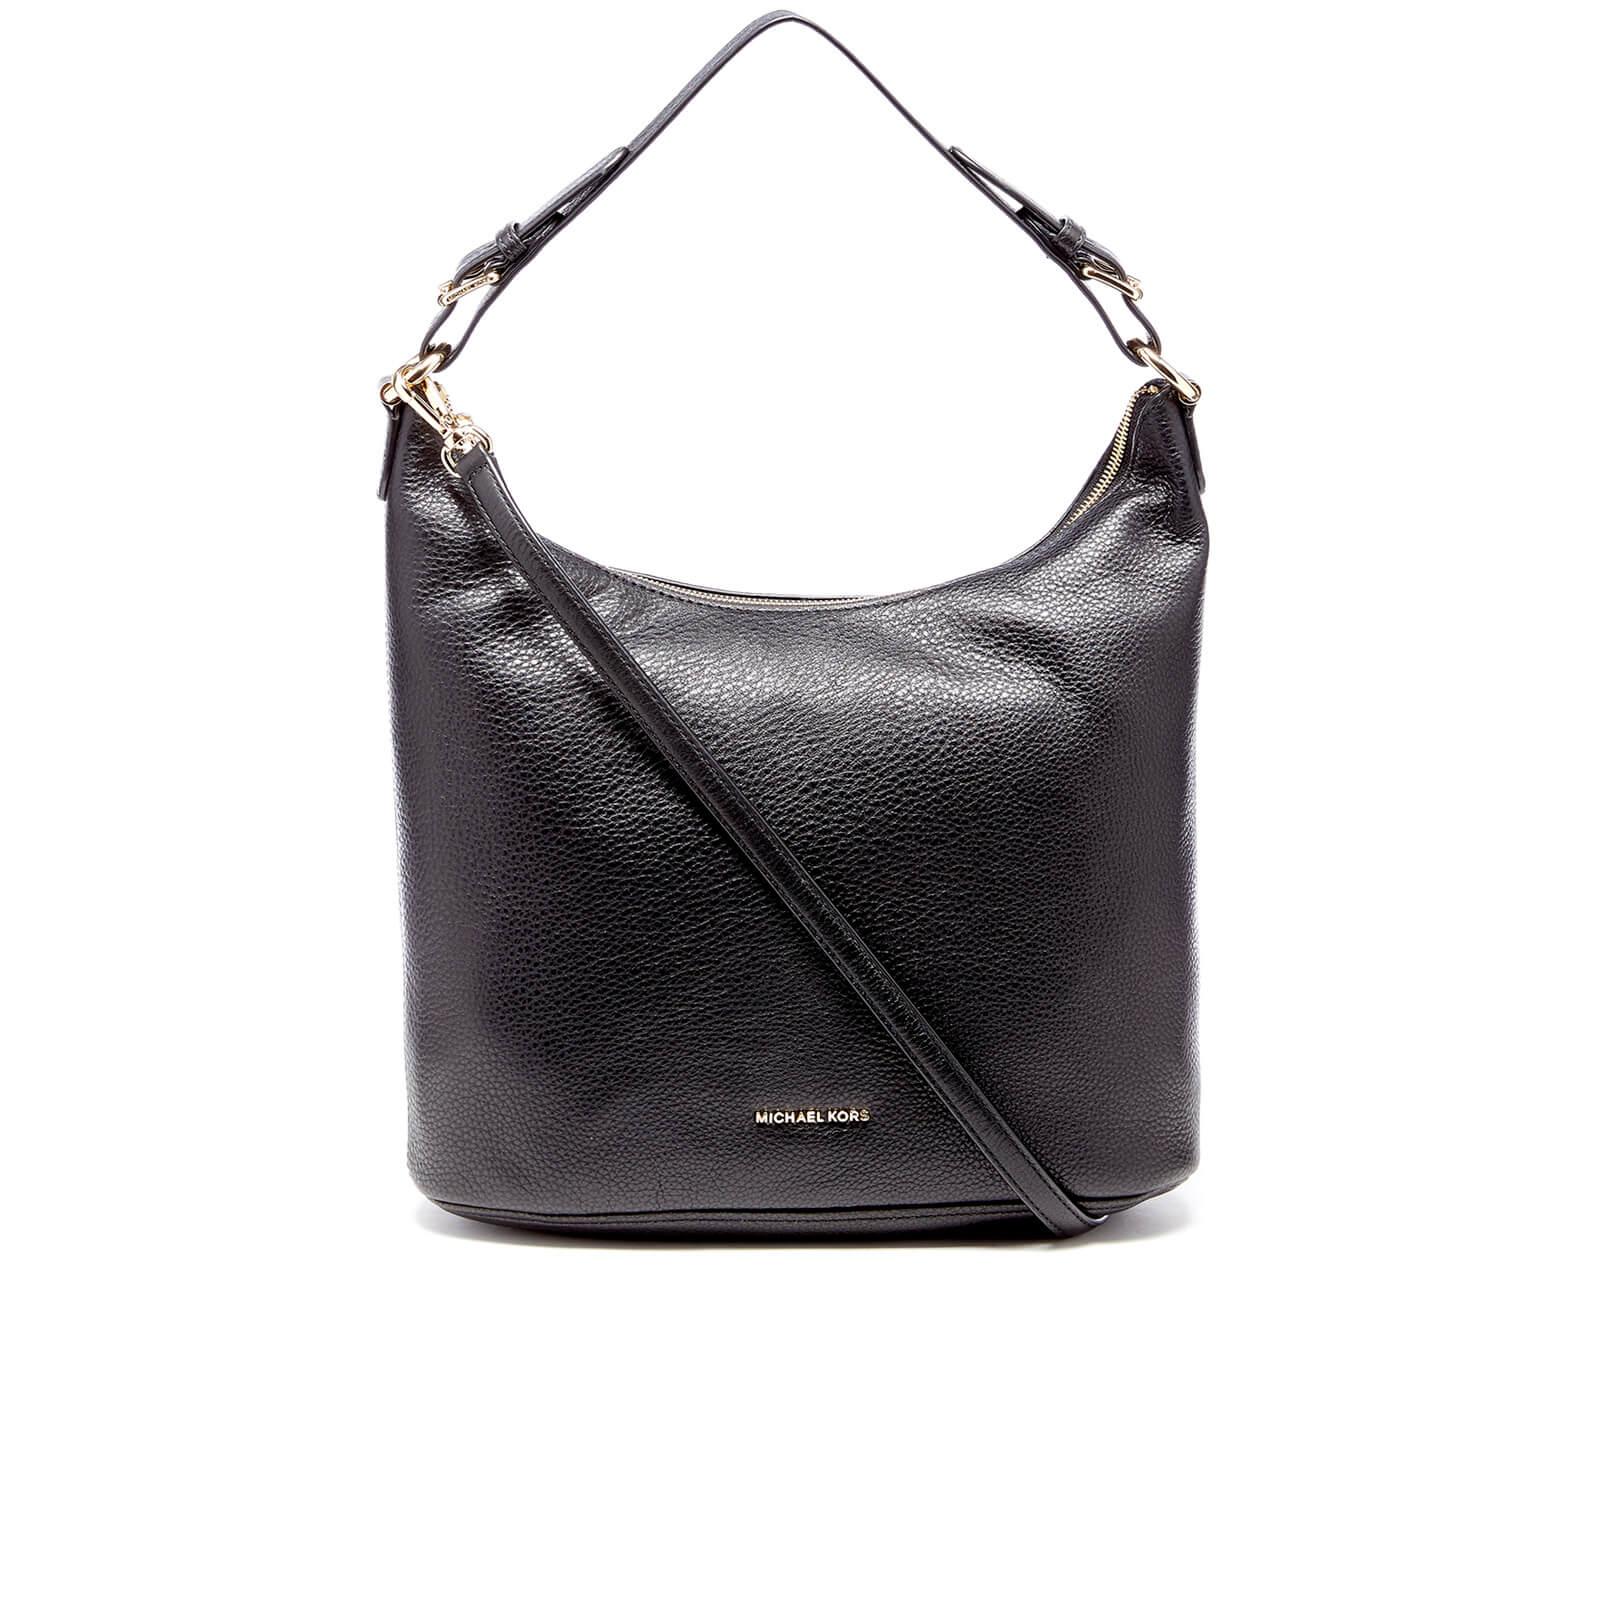 2ed6c7c4a4bf MICHAEL MICHAEL KORS Women s Lupita Large Hobo Bag - Black - Free UK  Delivery over £50